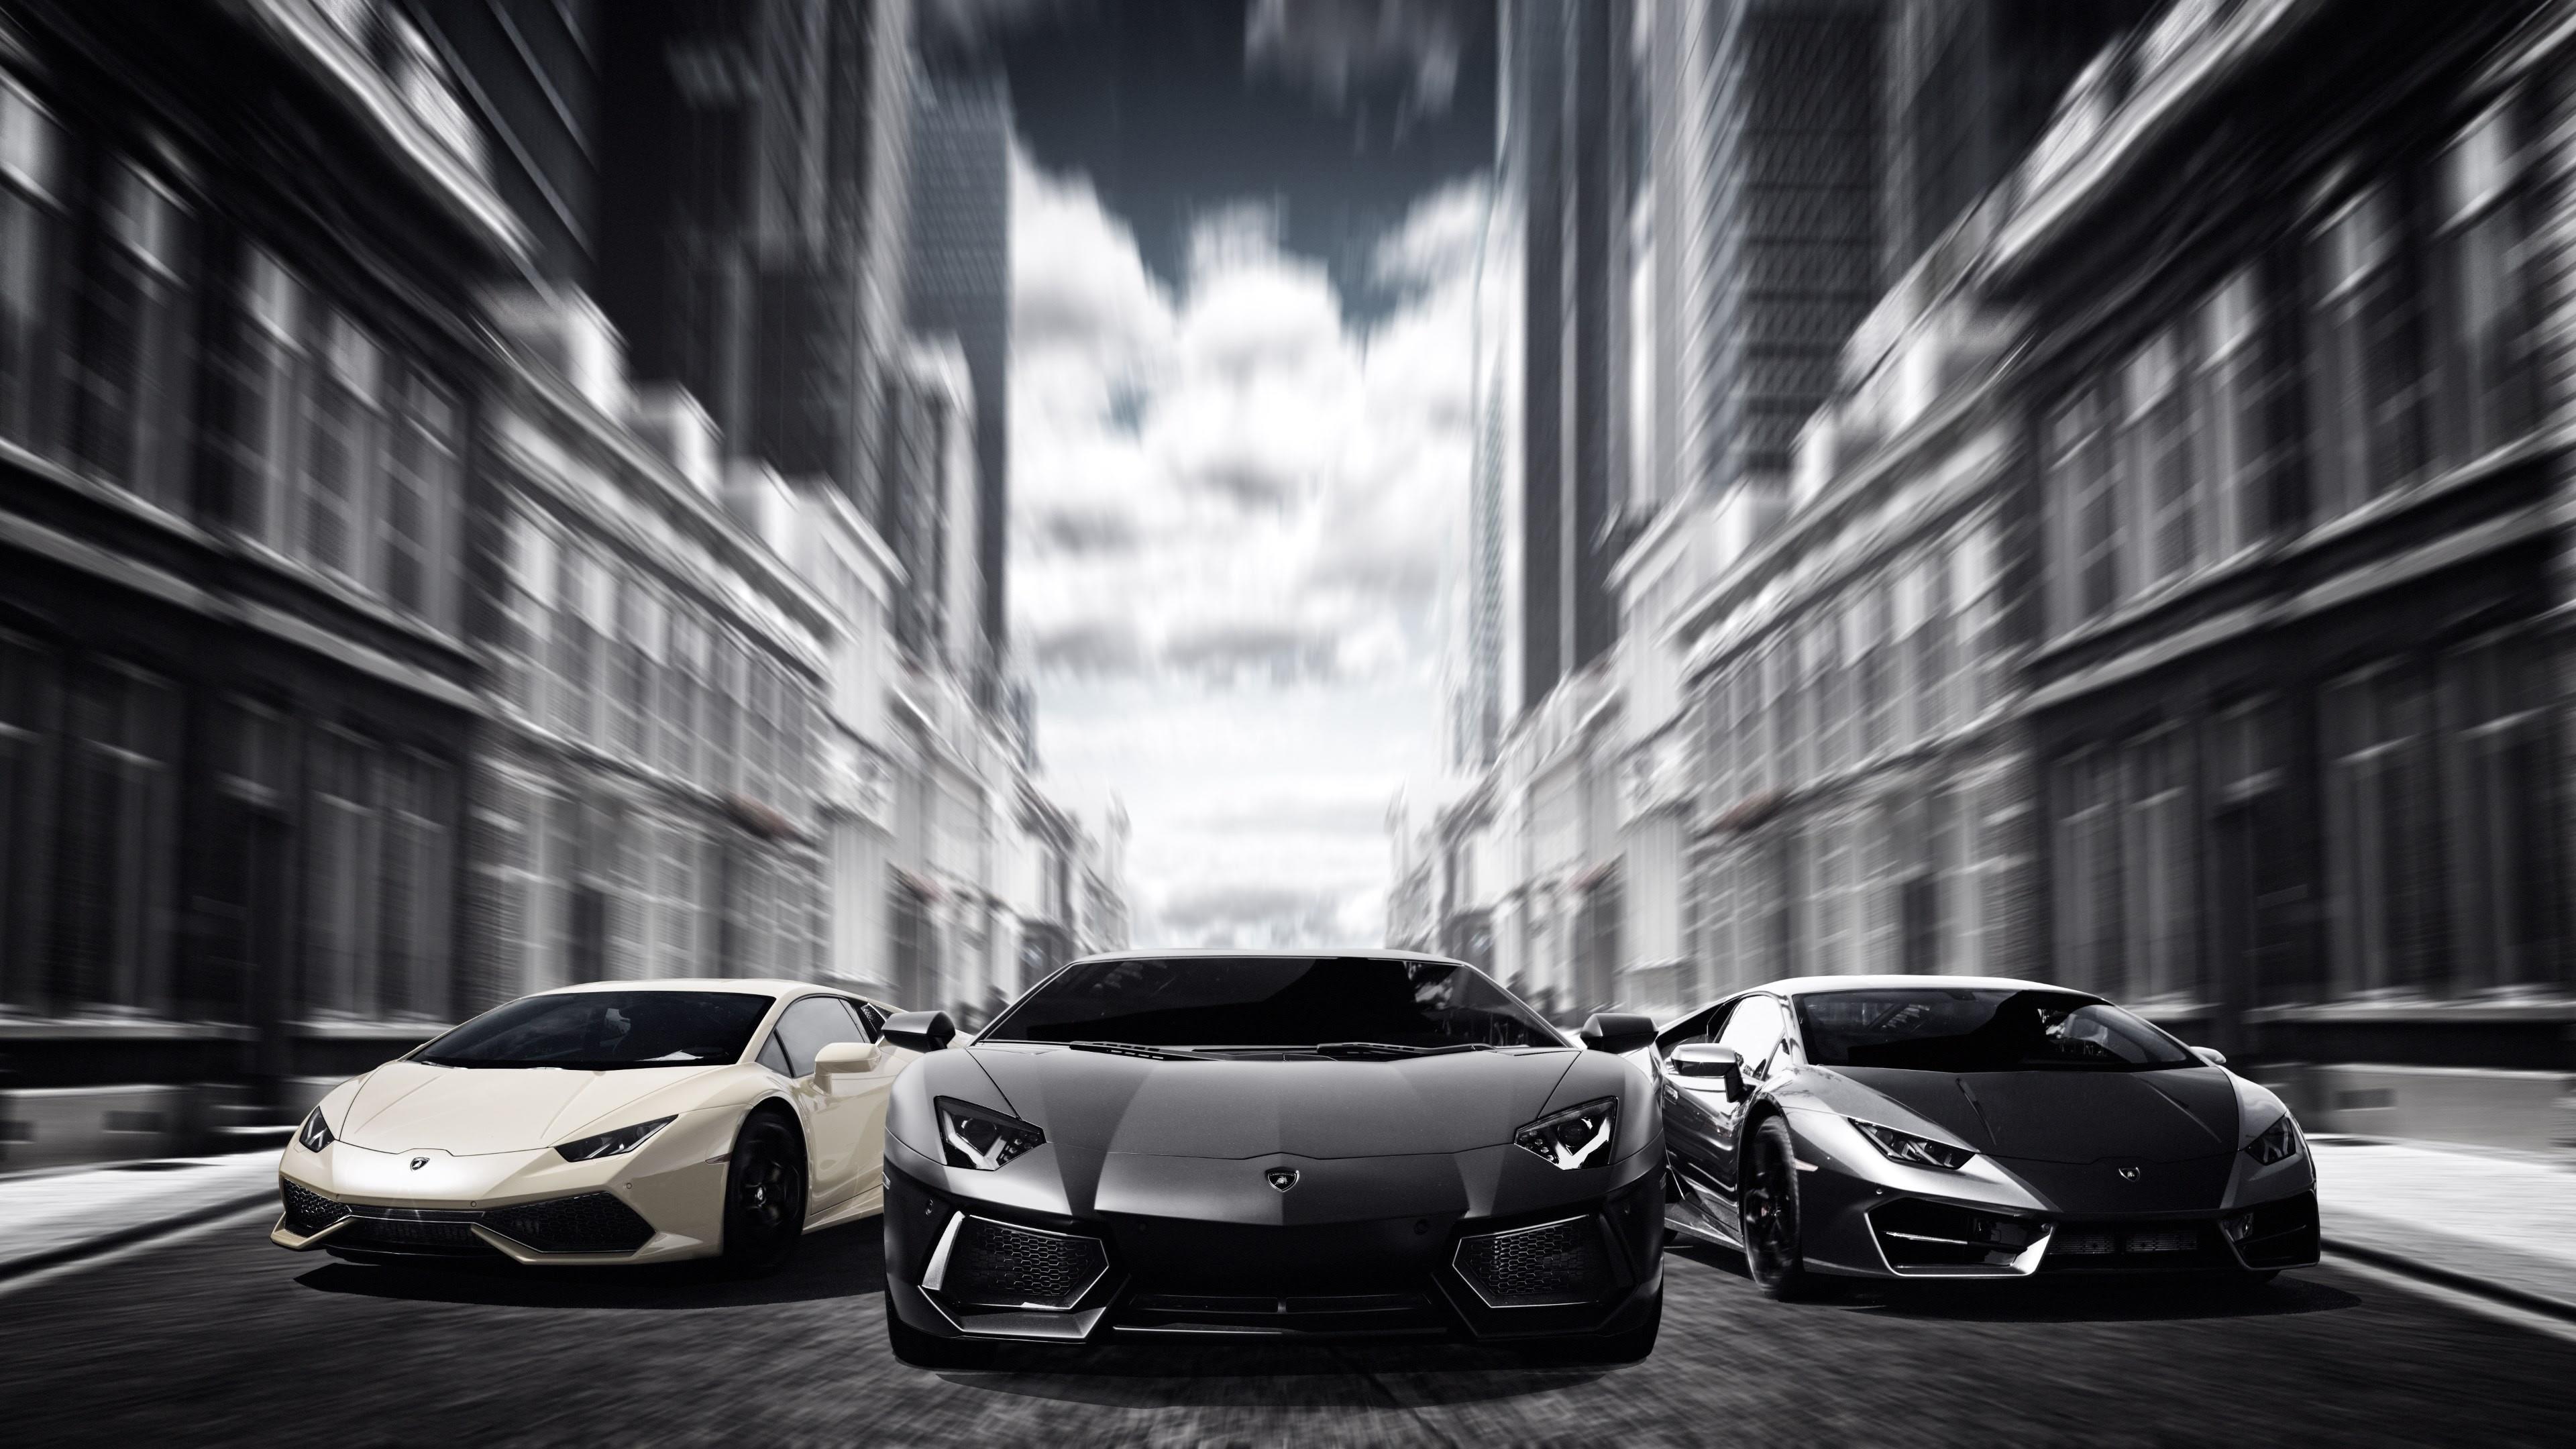 Lamborghinis Black And White 4k Hd Cars 4k Wallpapers Images